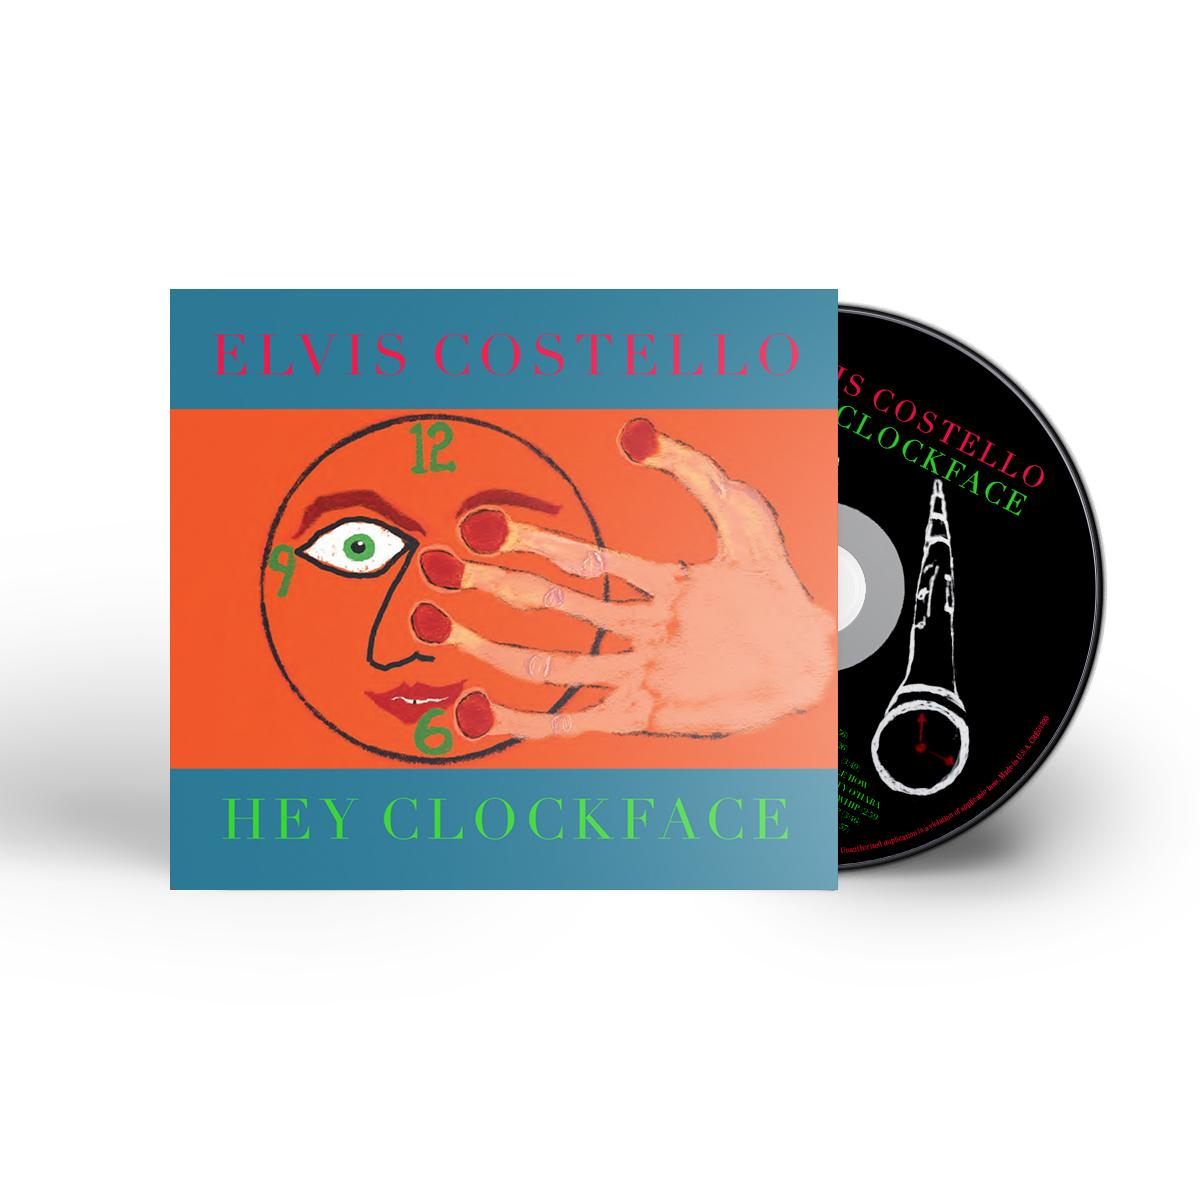 Hey Clockface custom socks + Hey Clockface 2xLP/Vinyl/CD/Download (optional)